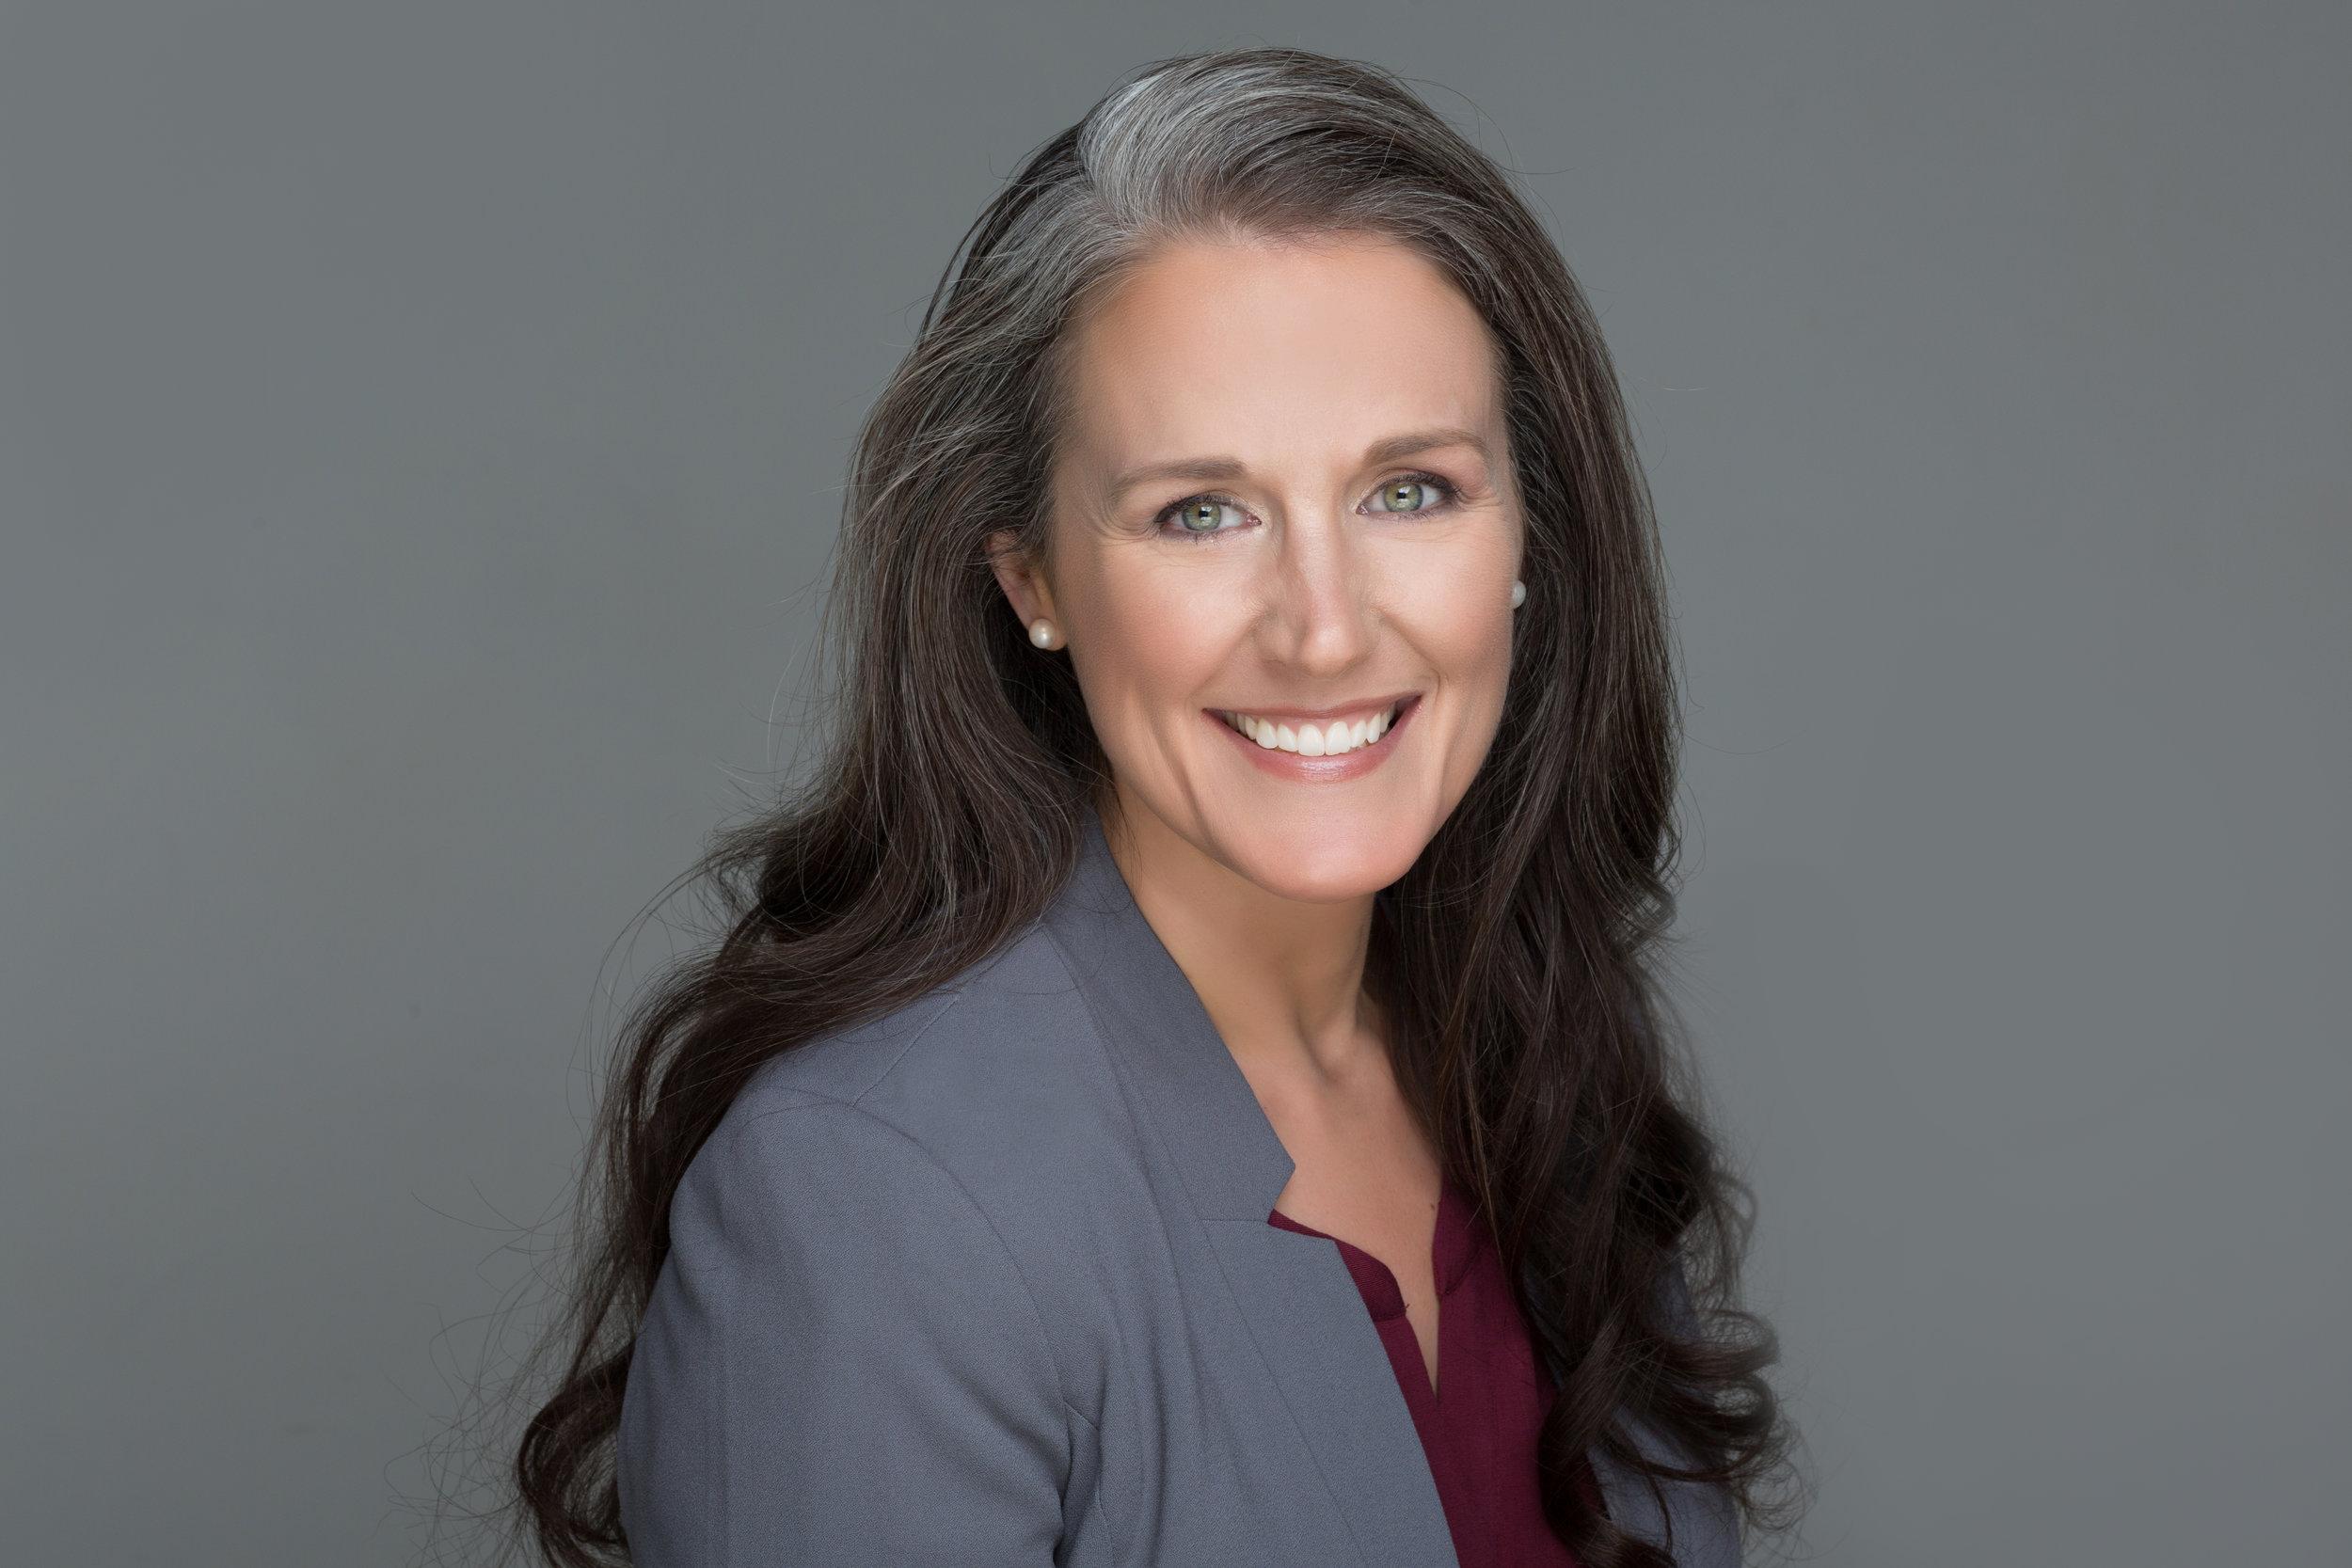 leesburg professional headshot woman